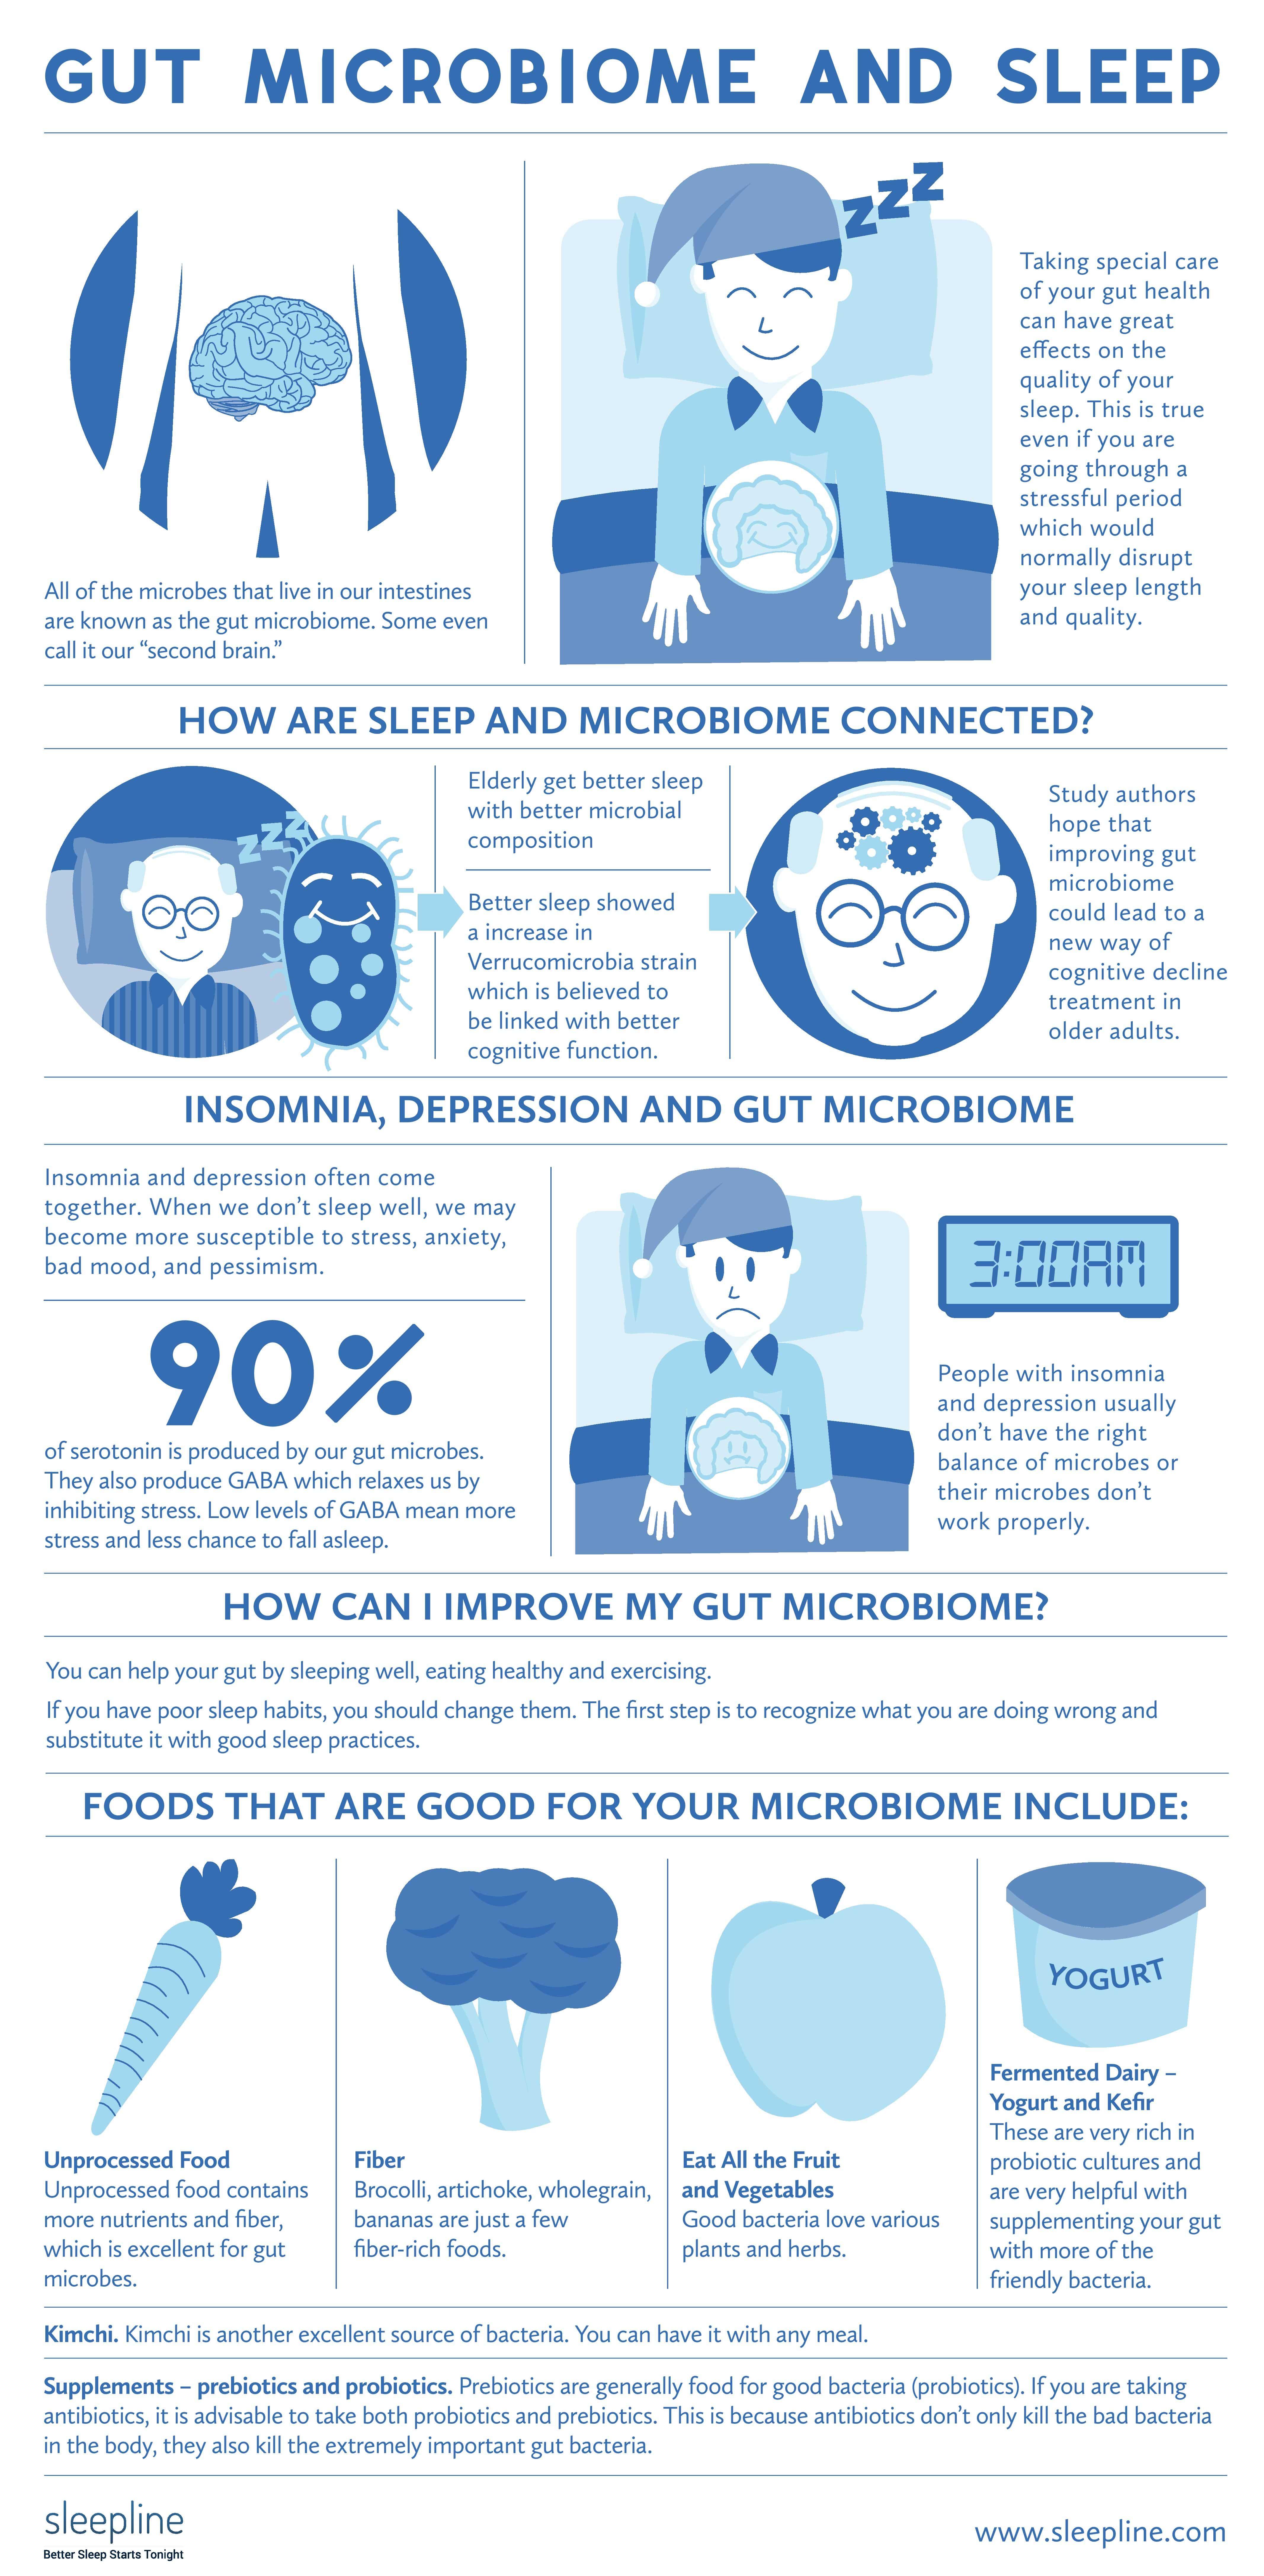 Gut Microbiome And Sleep by Sleepline.com